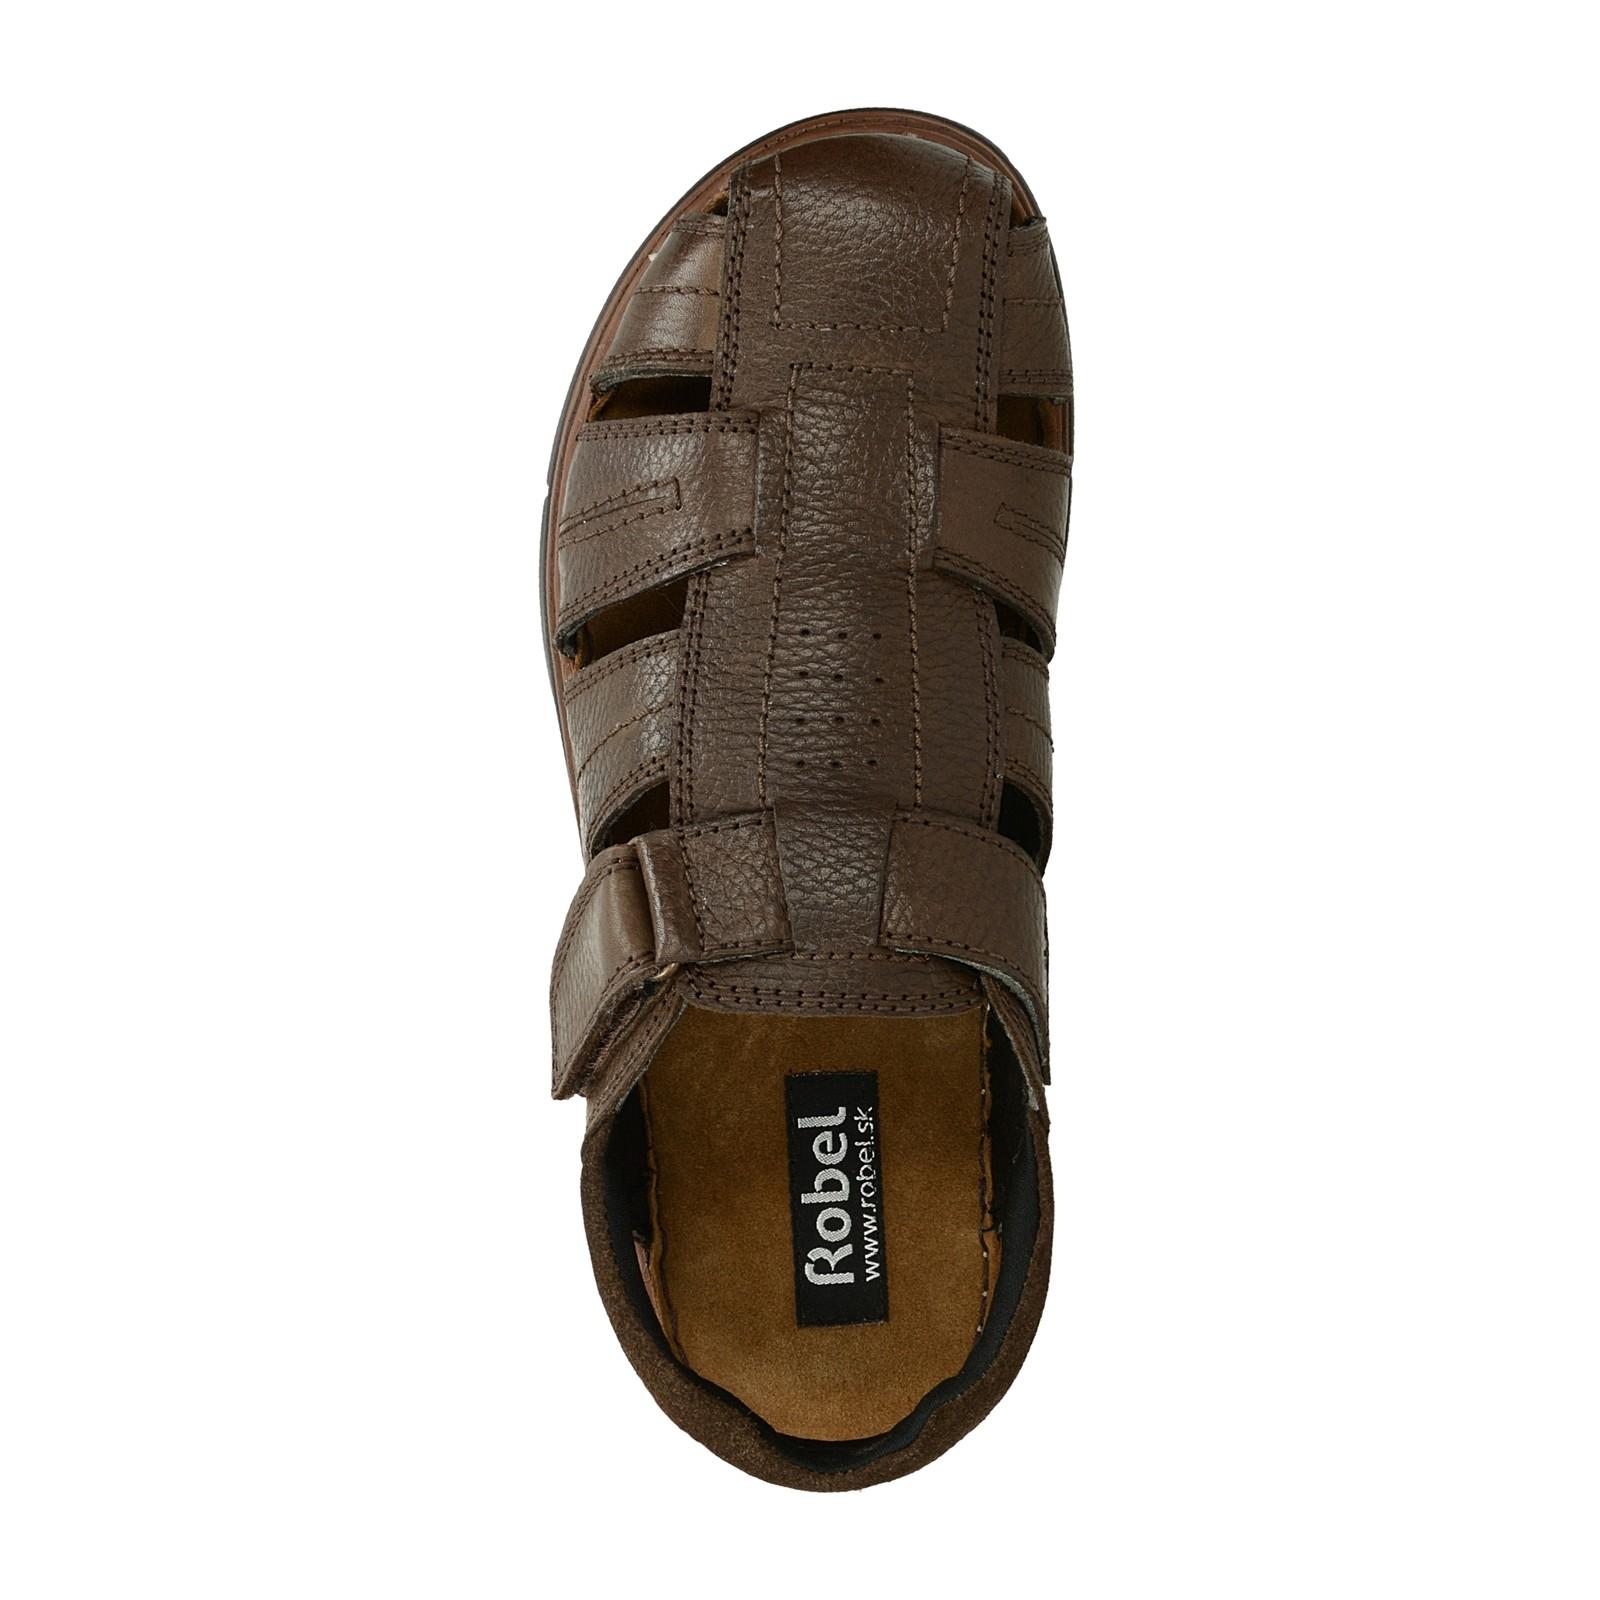 Robel pánské kožené sandály na suchý zip - tmavohnědé